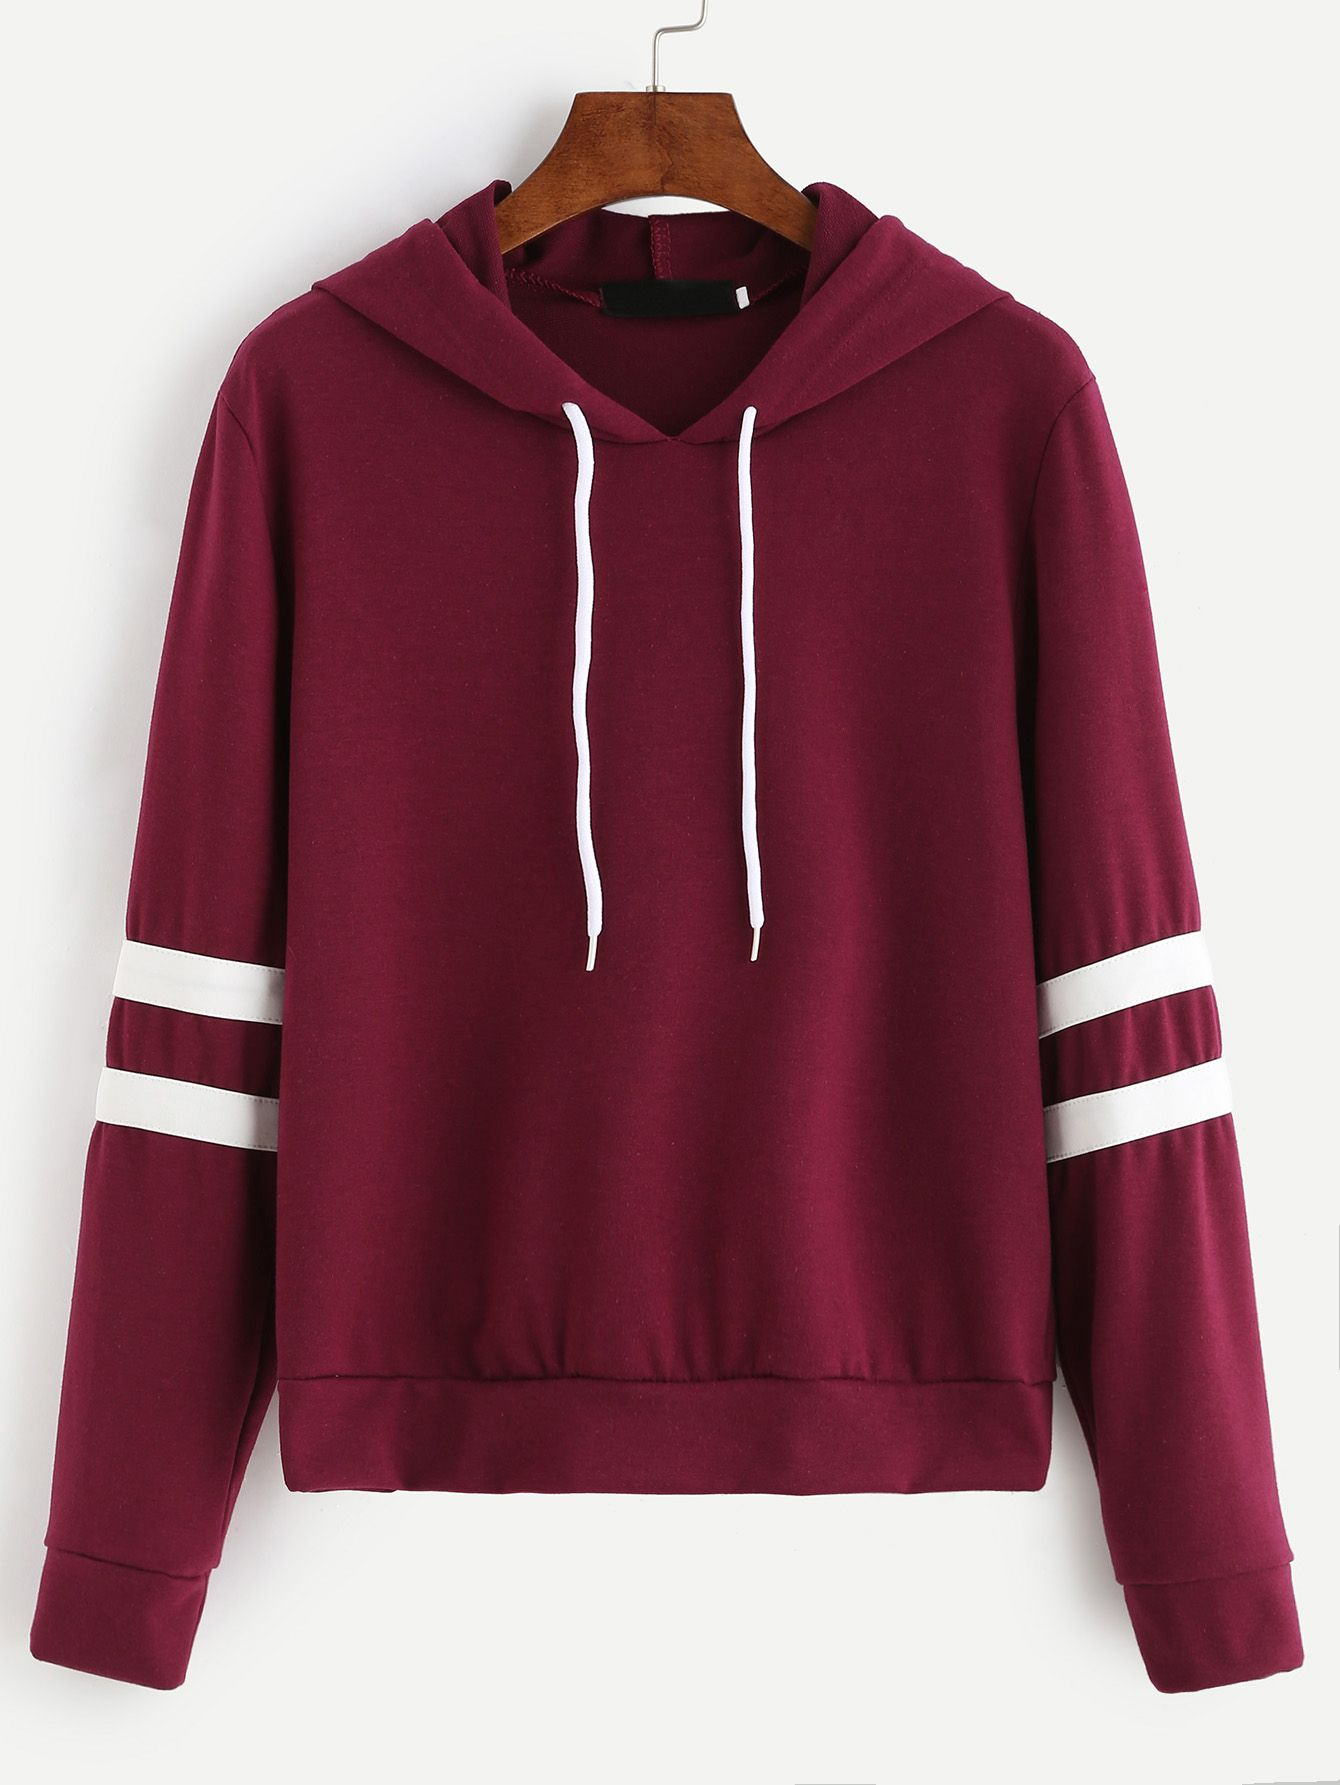 722a8b72856 Burgundy Varsity Striped Drawstring Hooded Sweatshirt Mobile Site ...